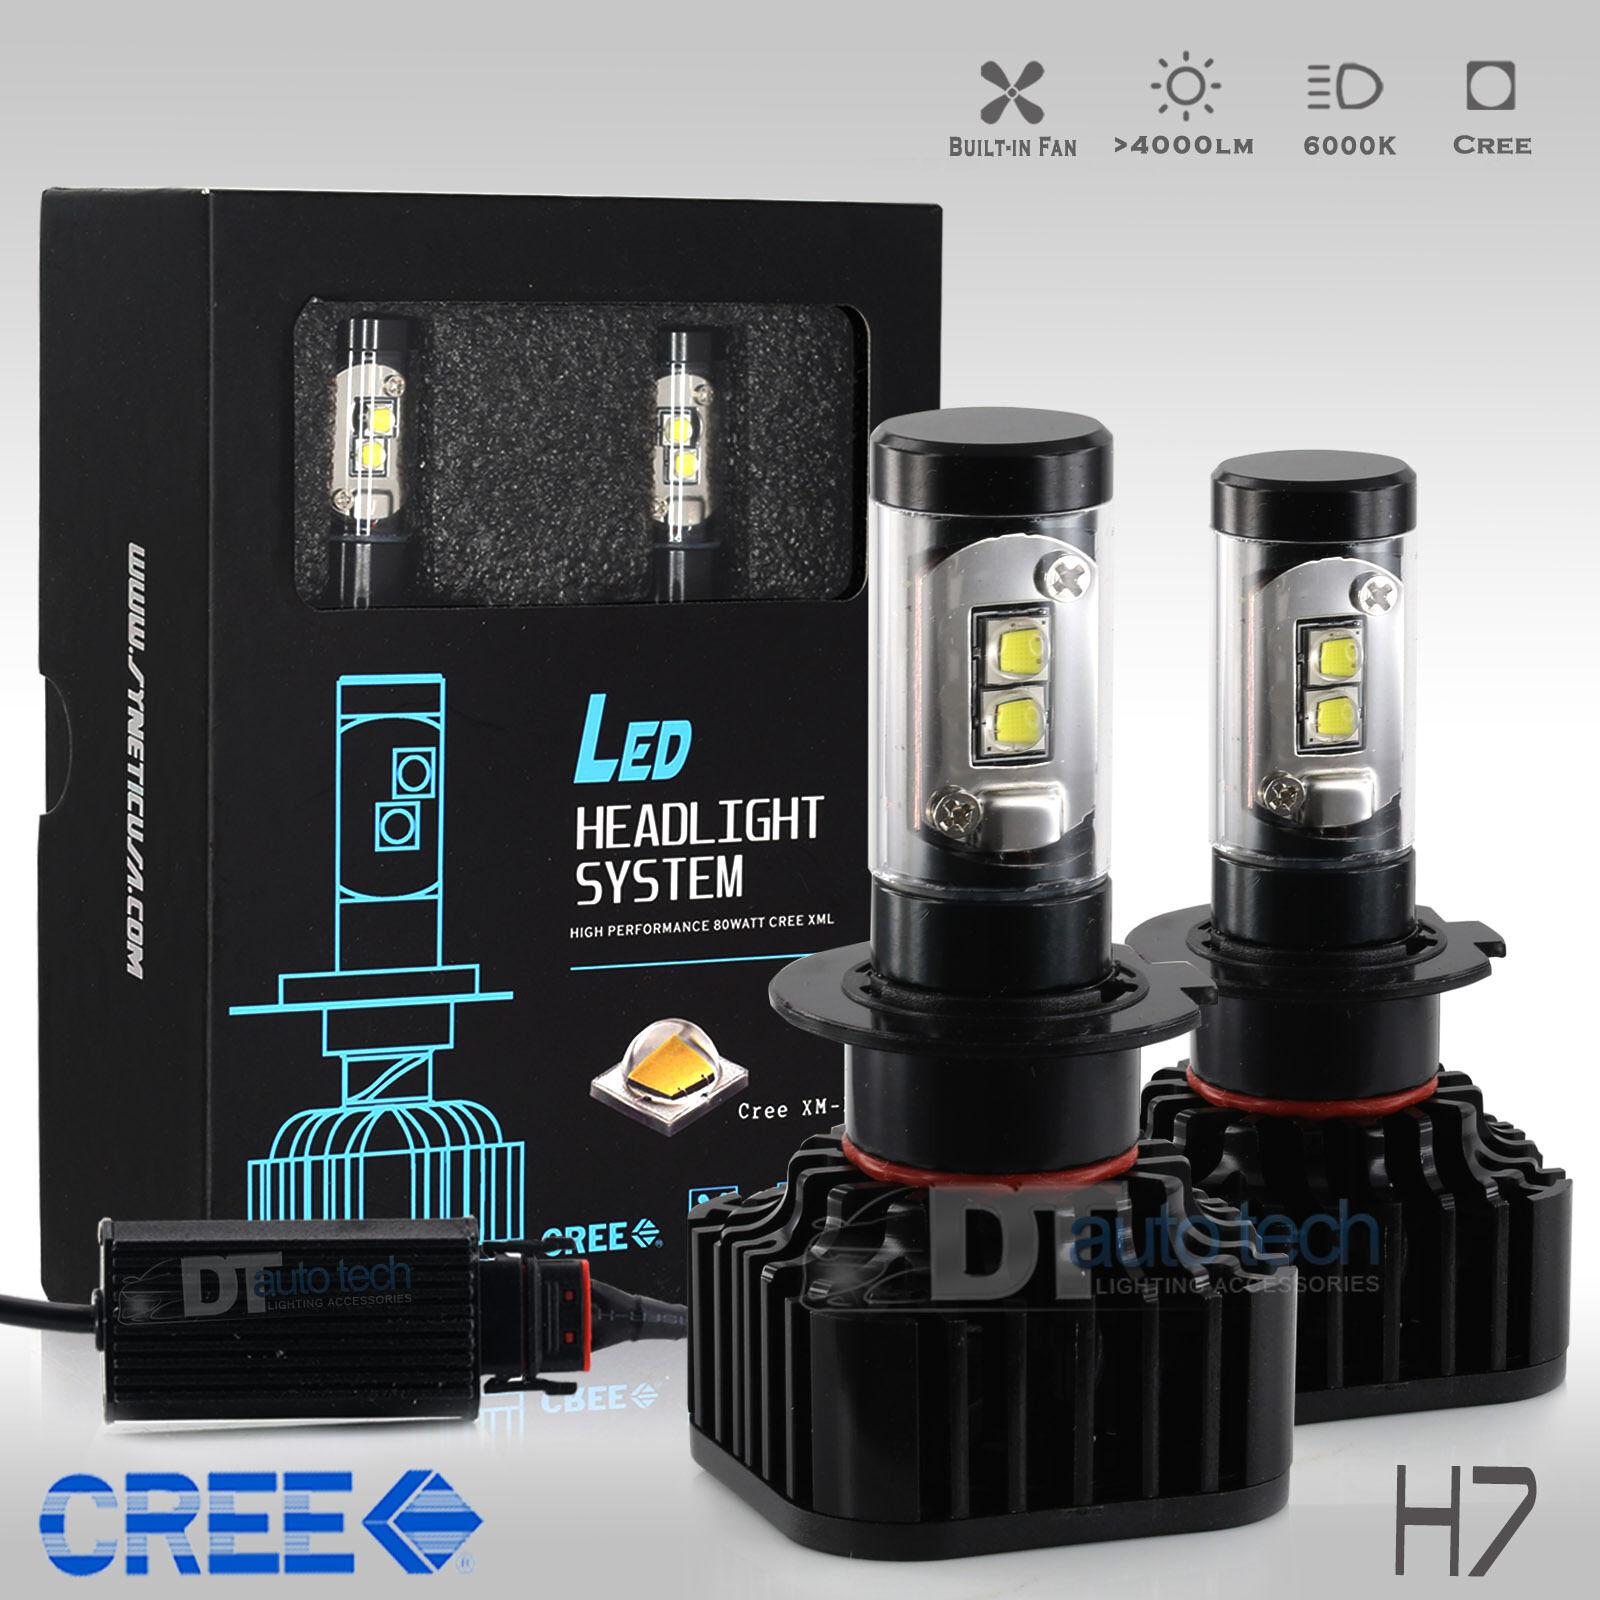 80w 8000lm h7 cree led headlight kit low beam light bulbs 6000k white high power ebay. Black Bedroom Furniture Sets. Home Design Ideas